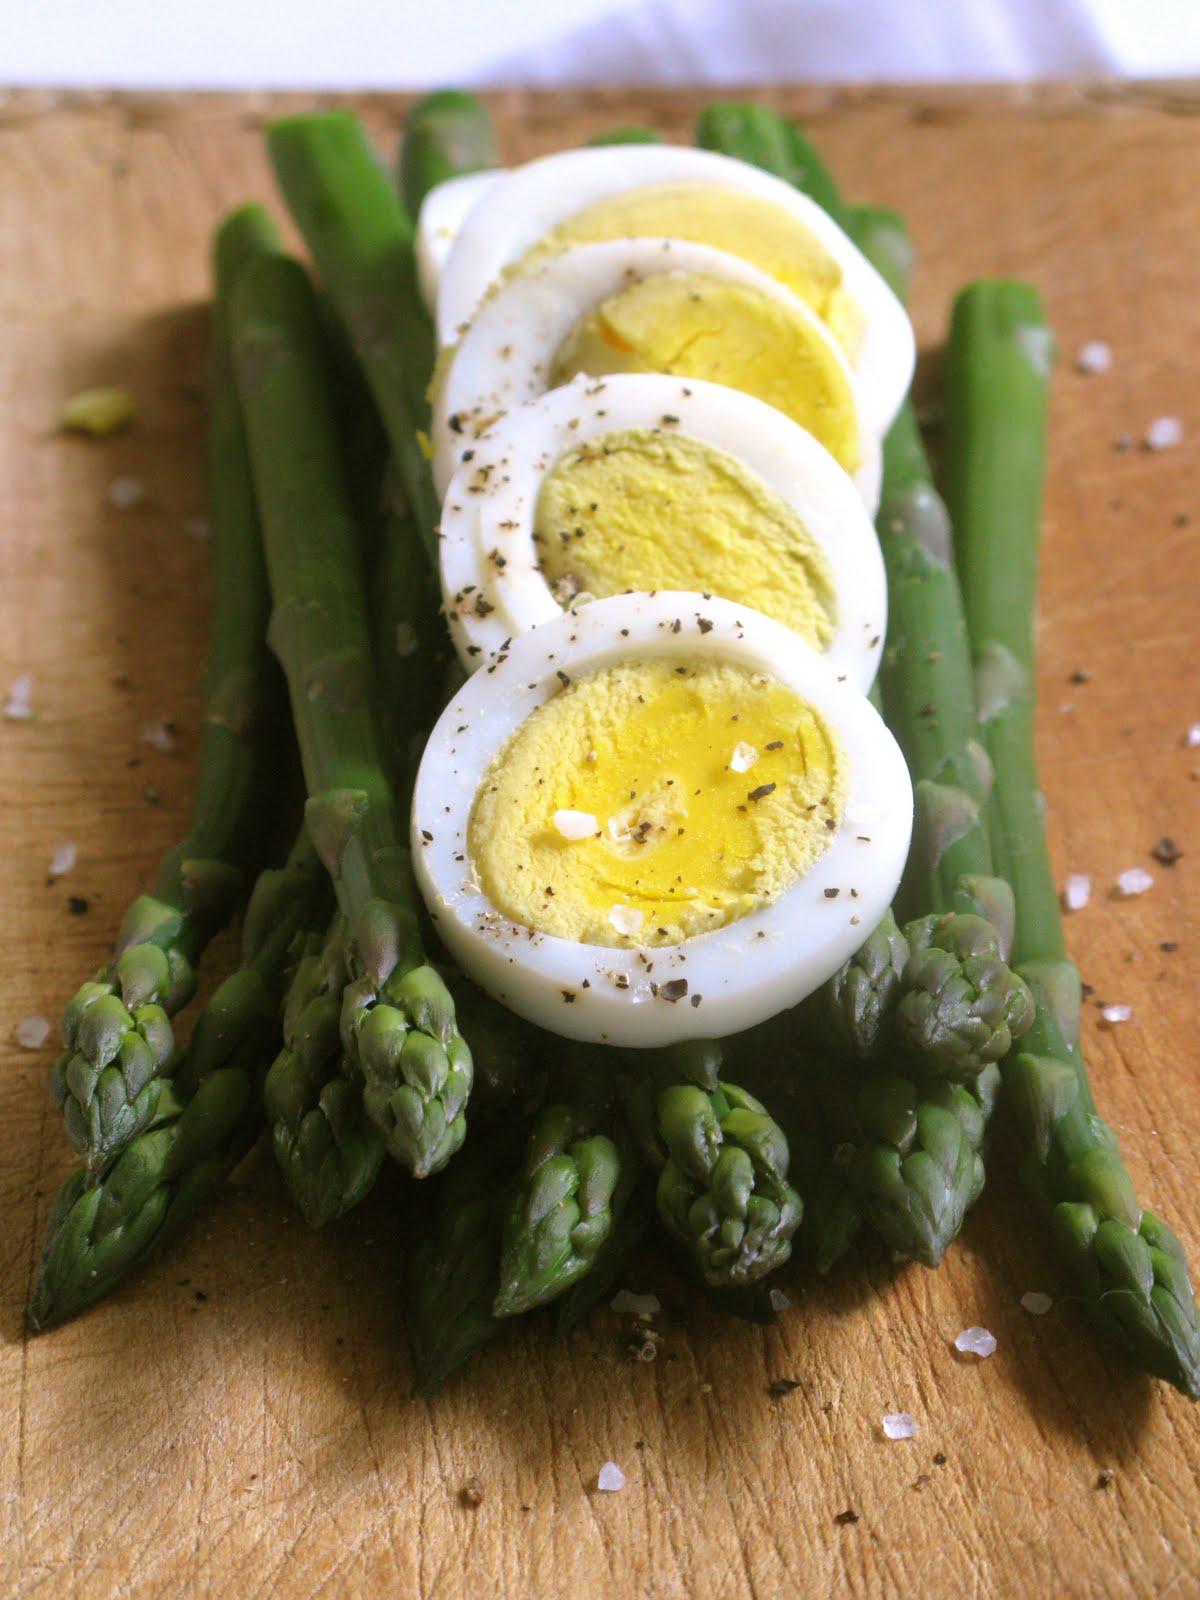 Figs, Bay & Wine: Asparagus Harvest Salad with Dijon Vinaigrette